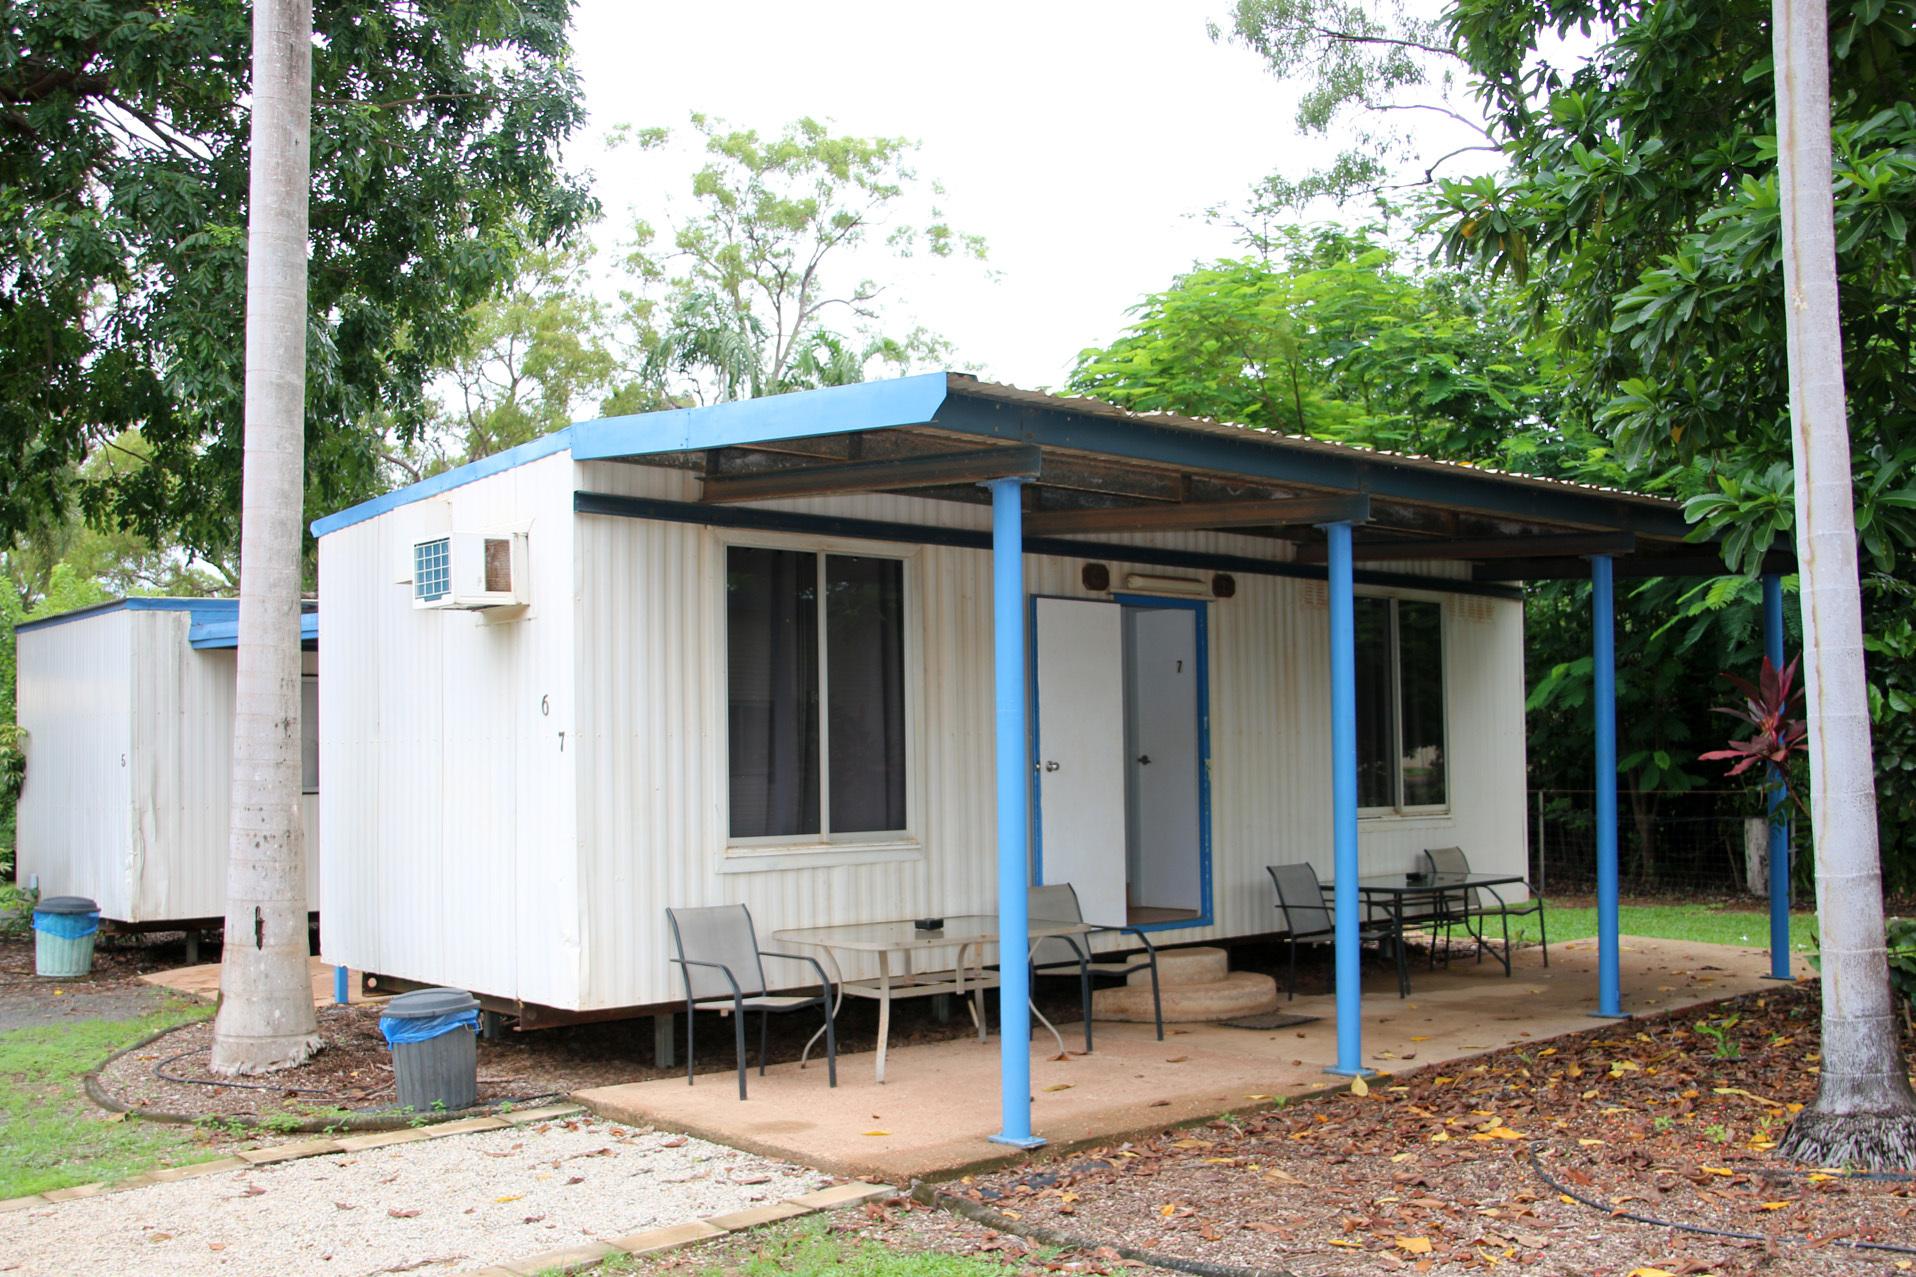 f - Weipa Caravan Park & Camping Ground